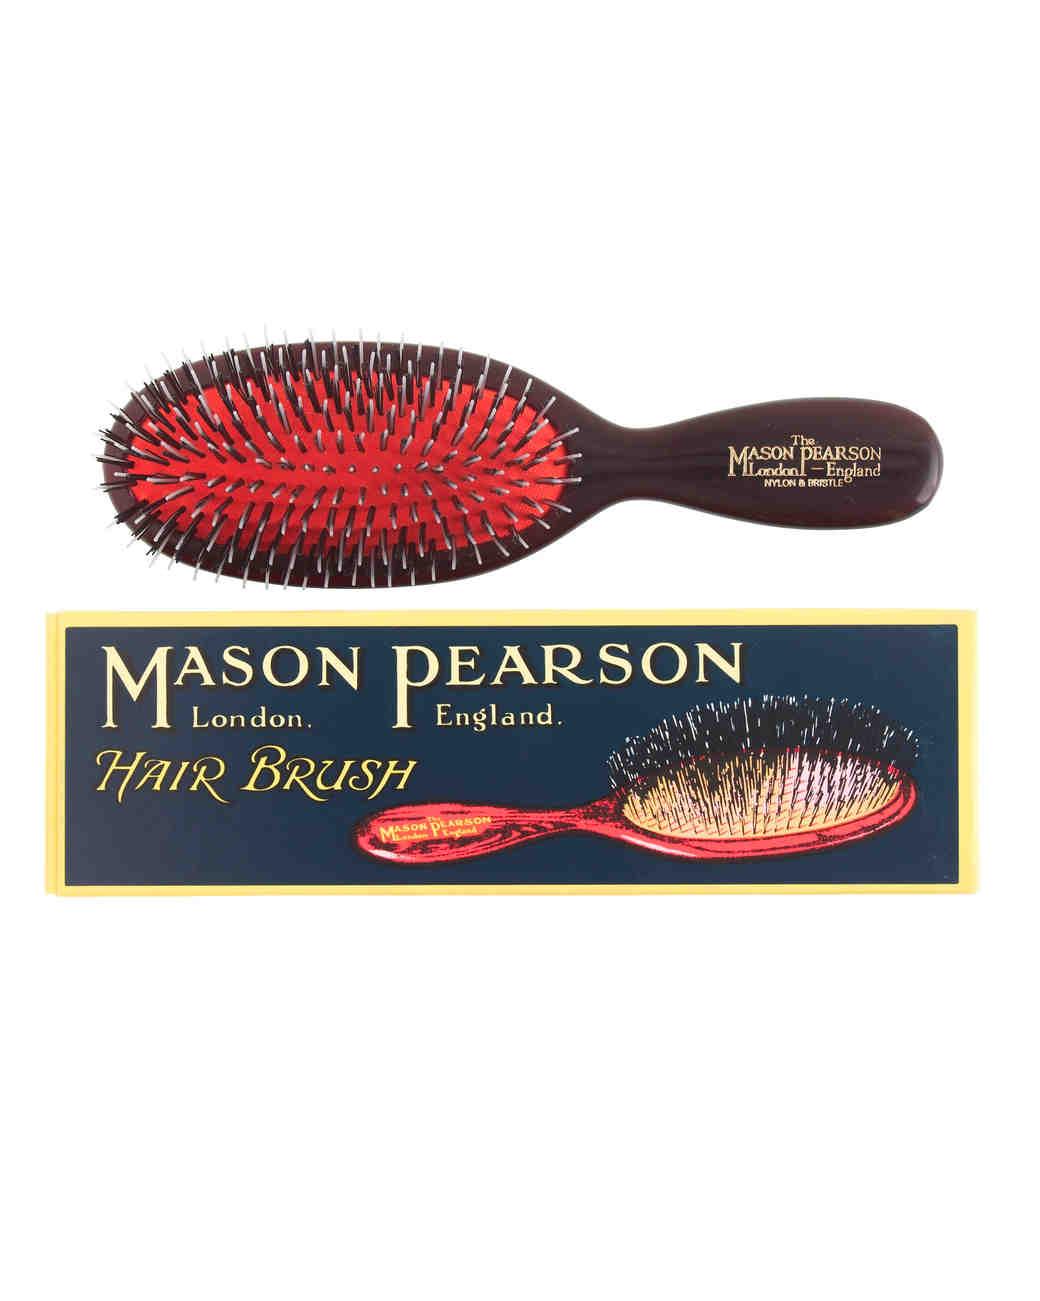 bridesmaid-gifts-mason-pearson-brush-jcrew-0914.jpg